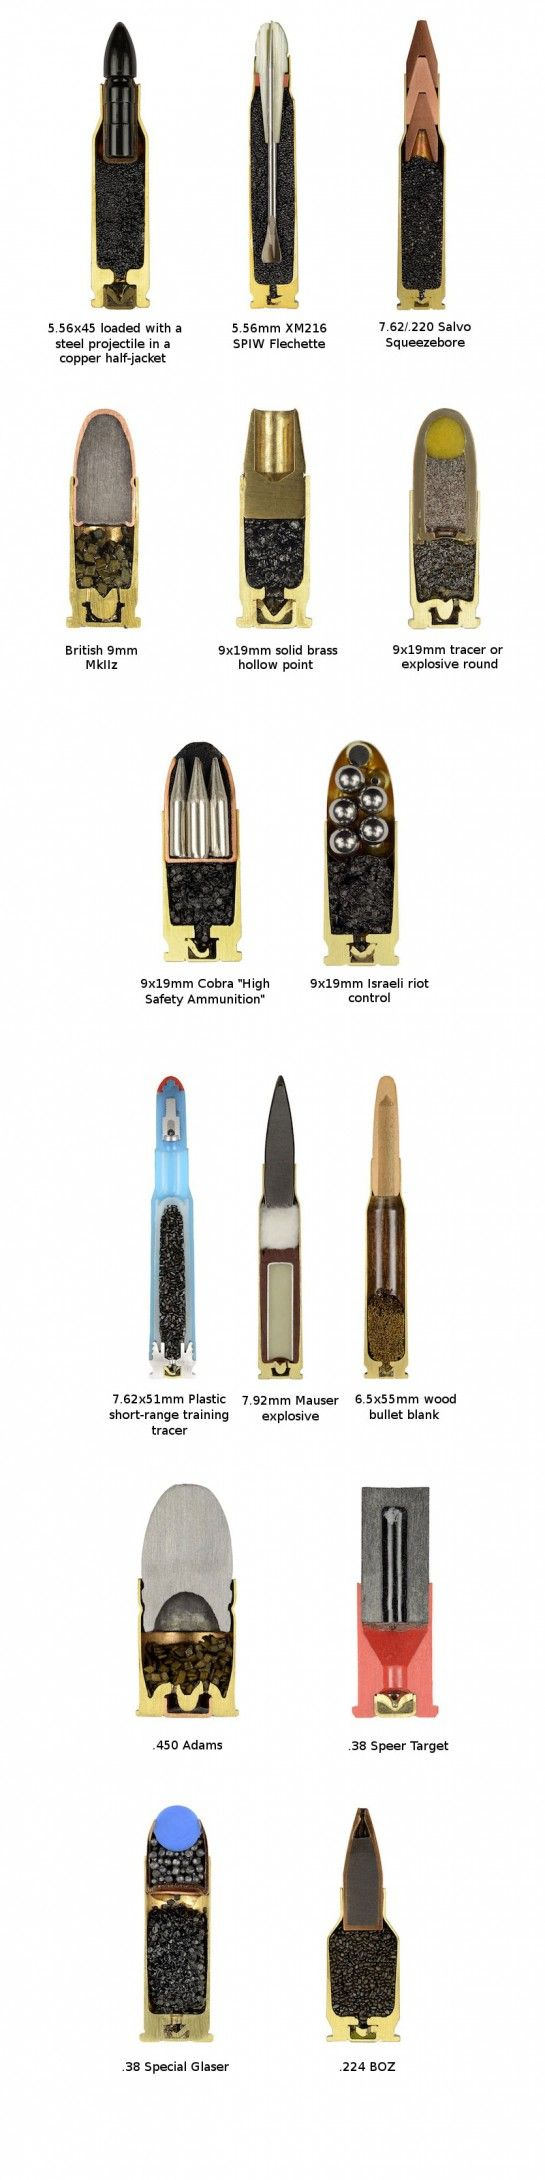 Bullets Anatomy By Sabine Pearlman